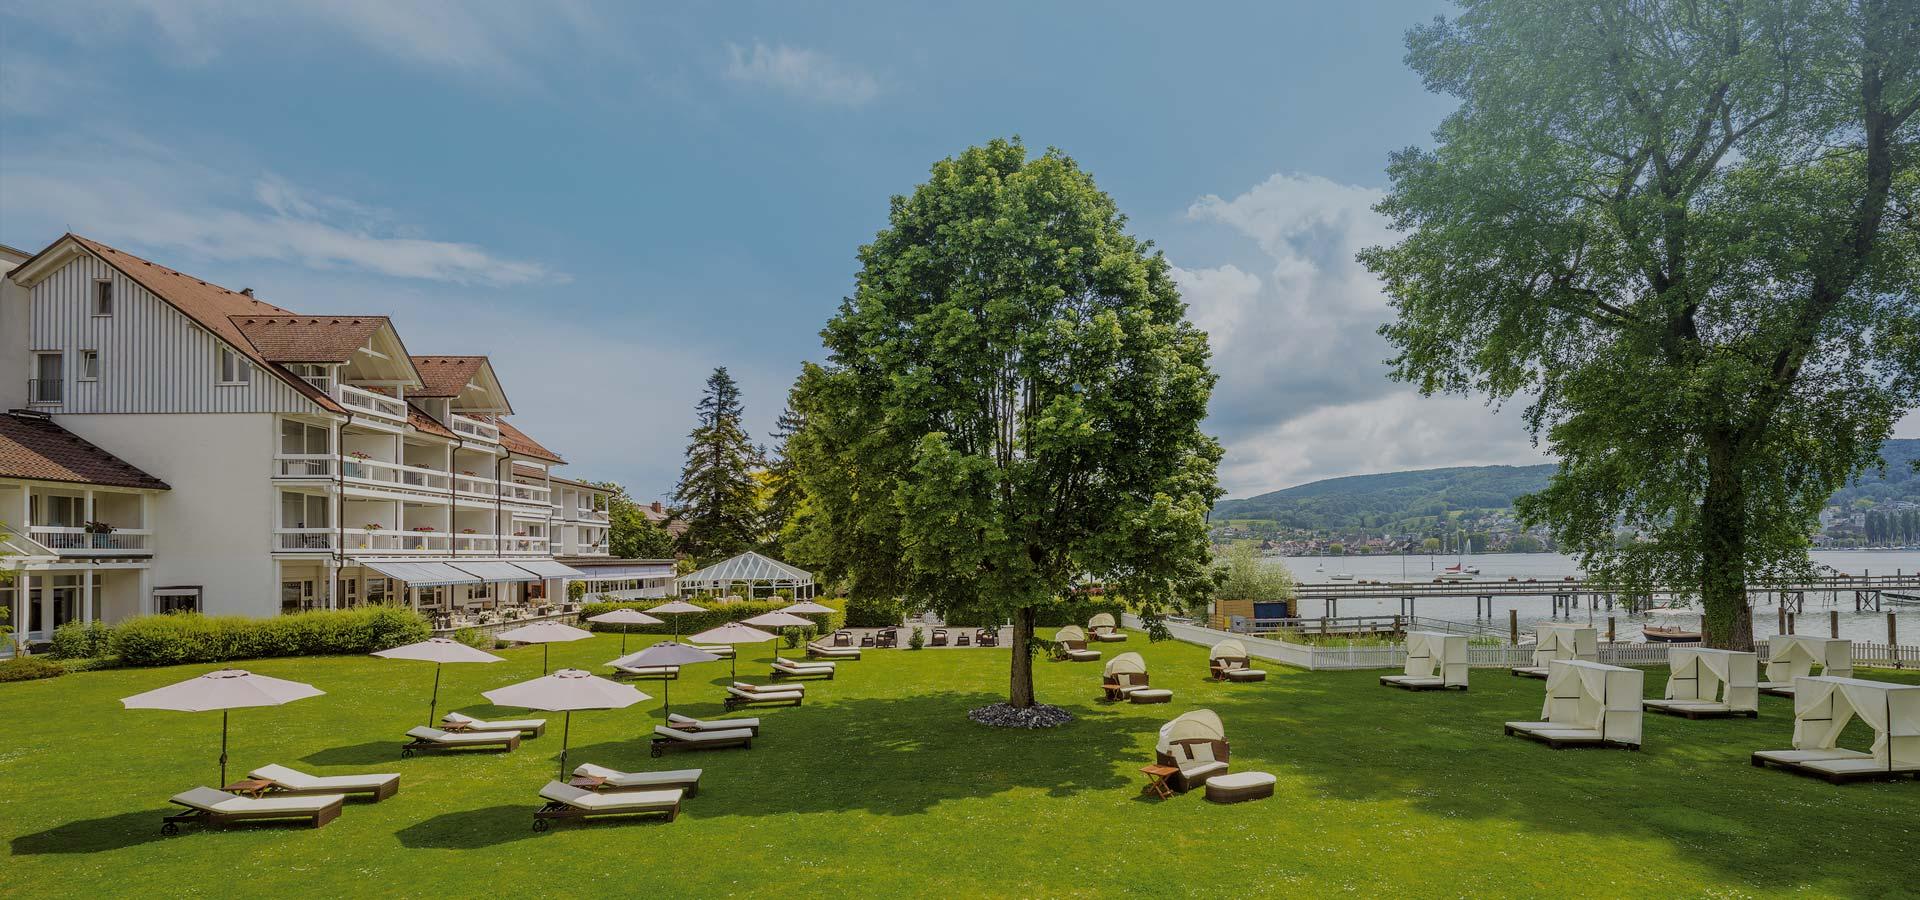 Gartenblick des Hotel HOERI am Bodensee